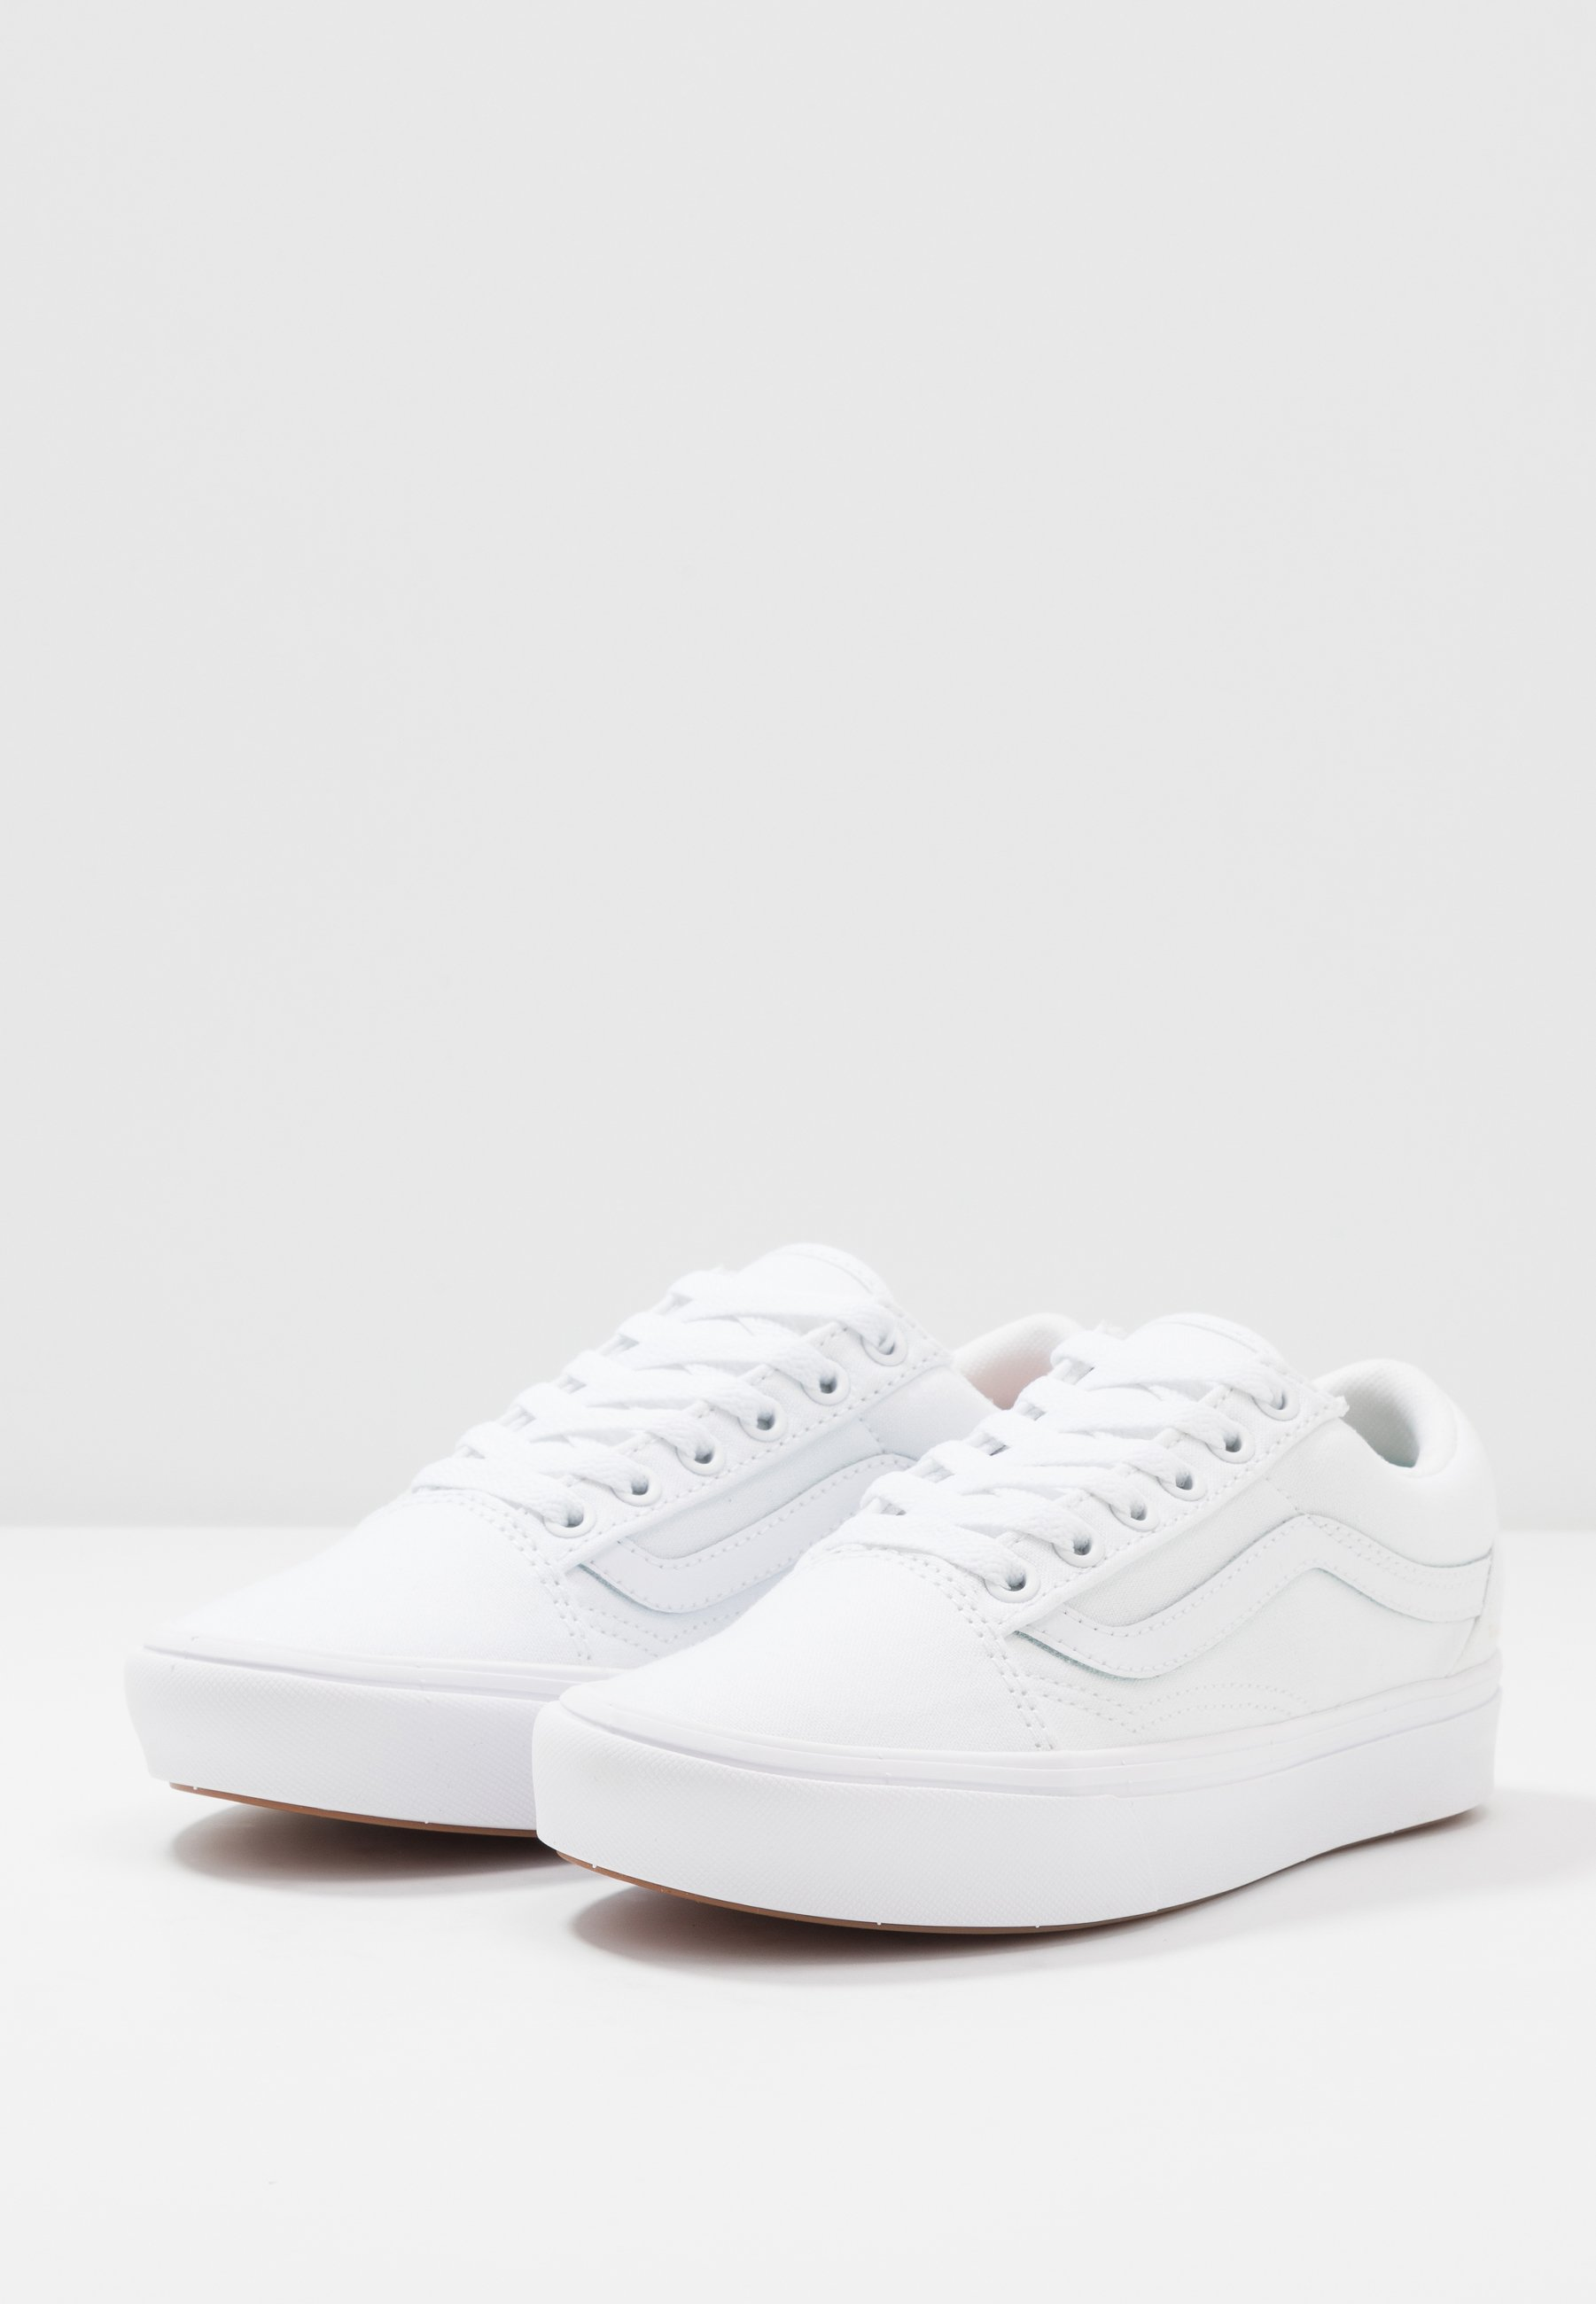 Vans Comfycush Old Skool - Baskets Basses True White